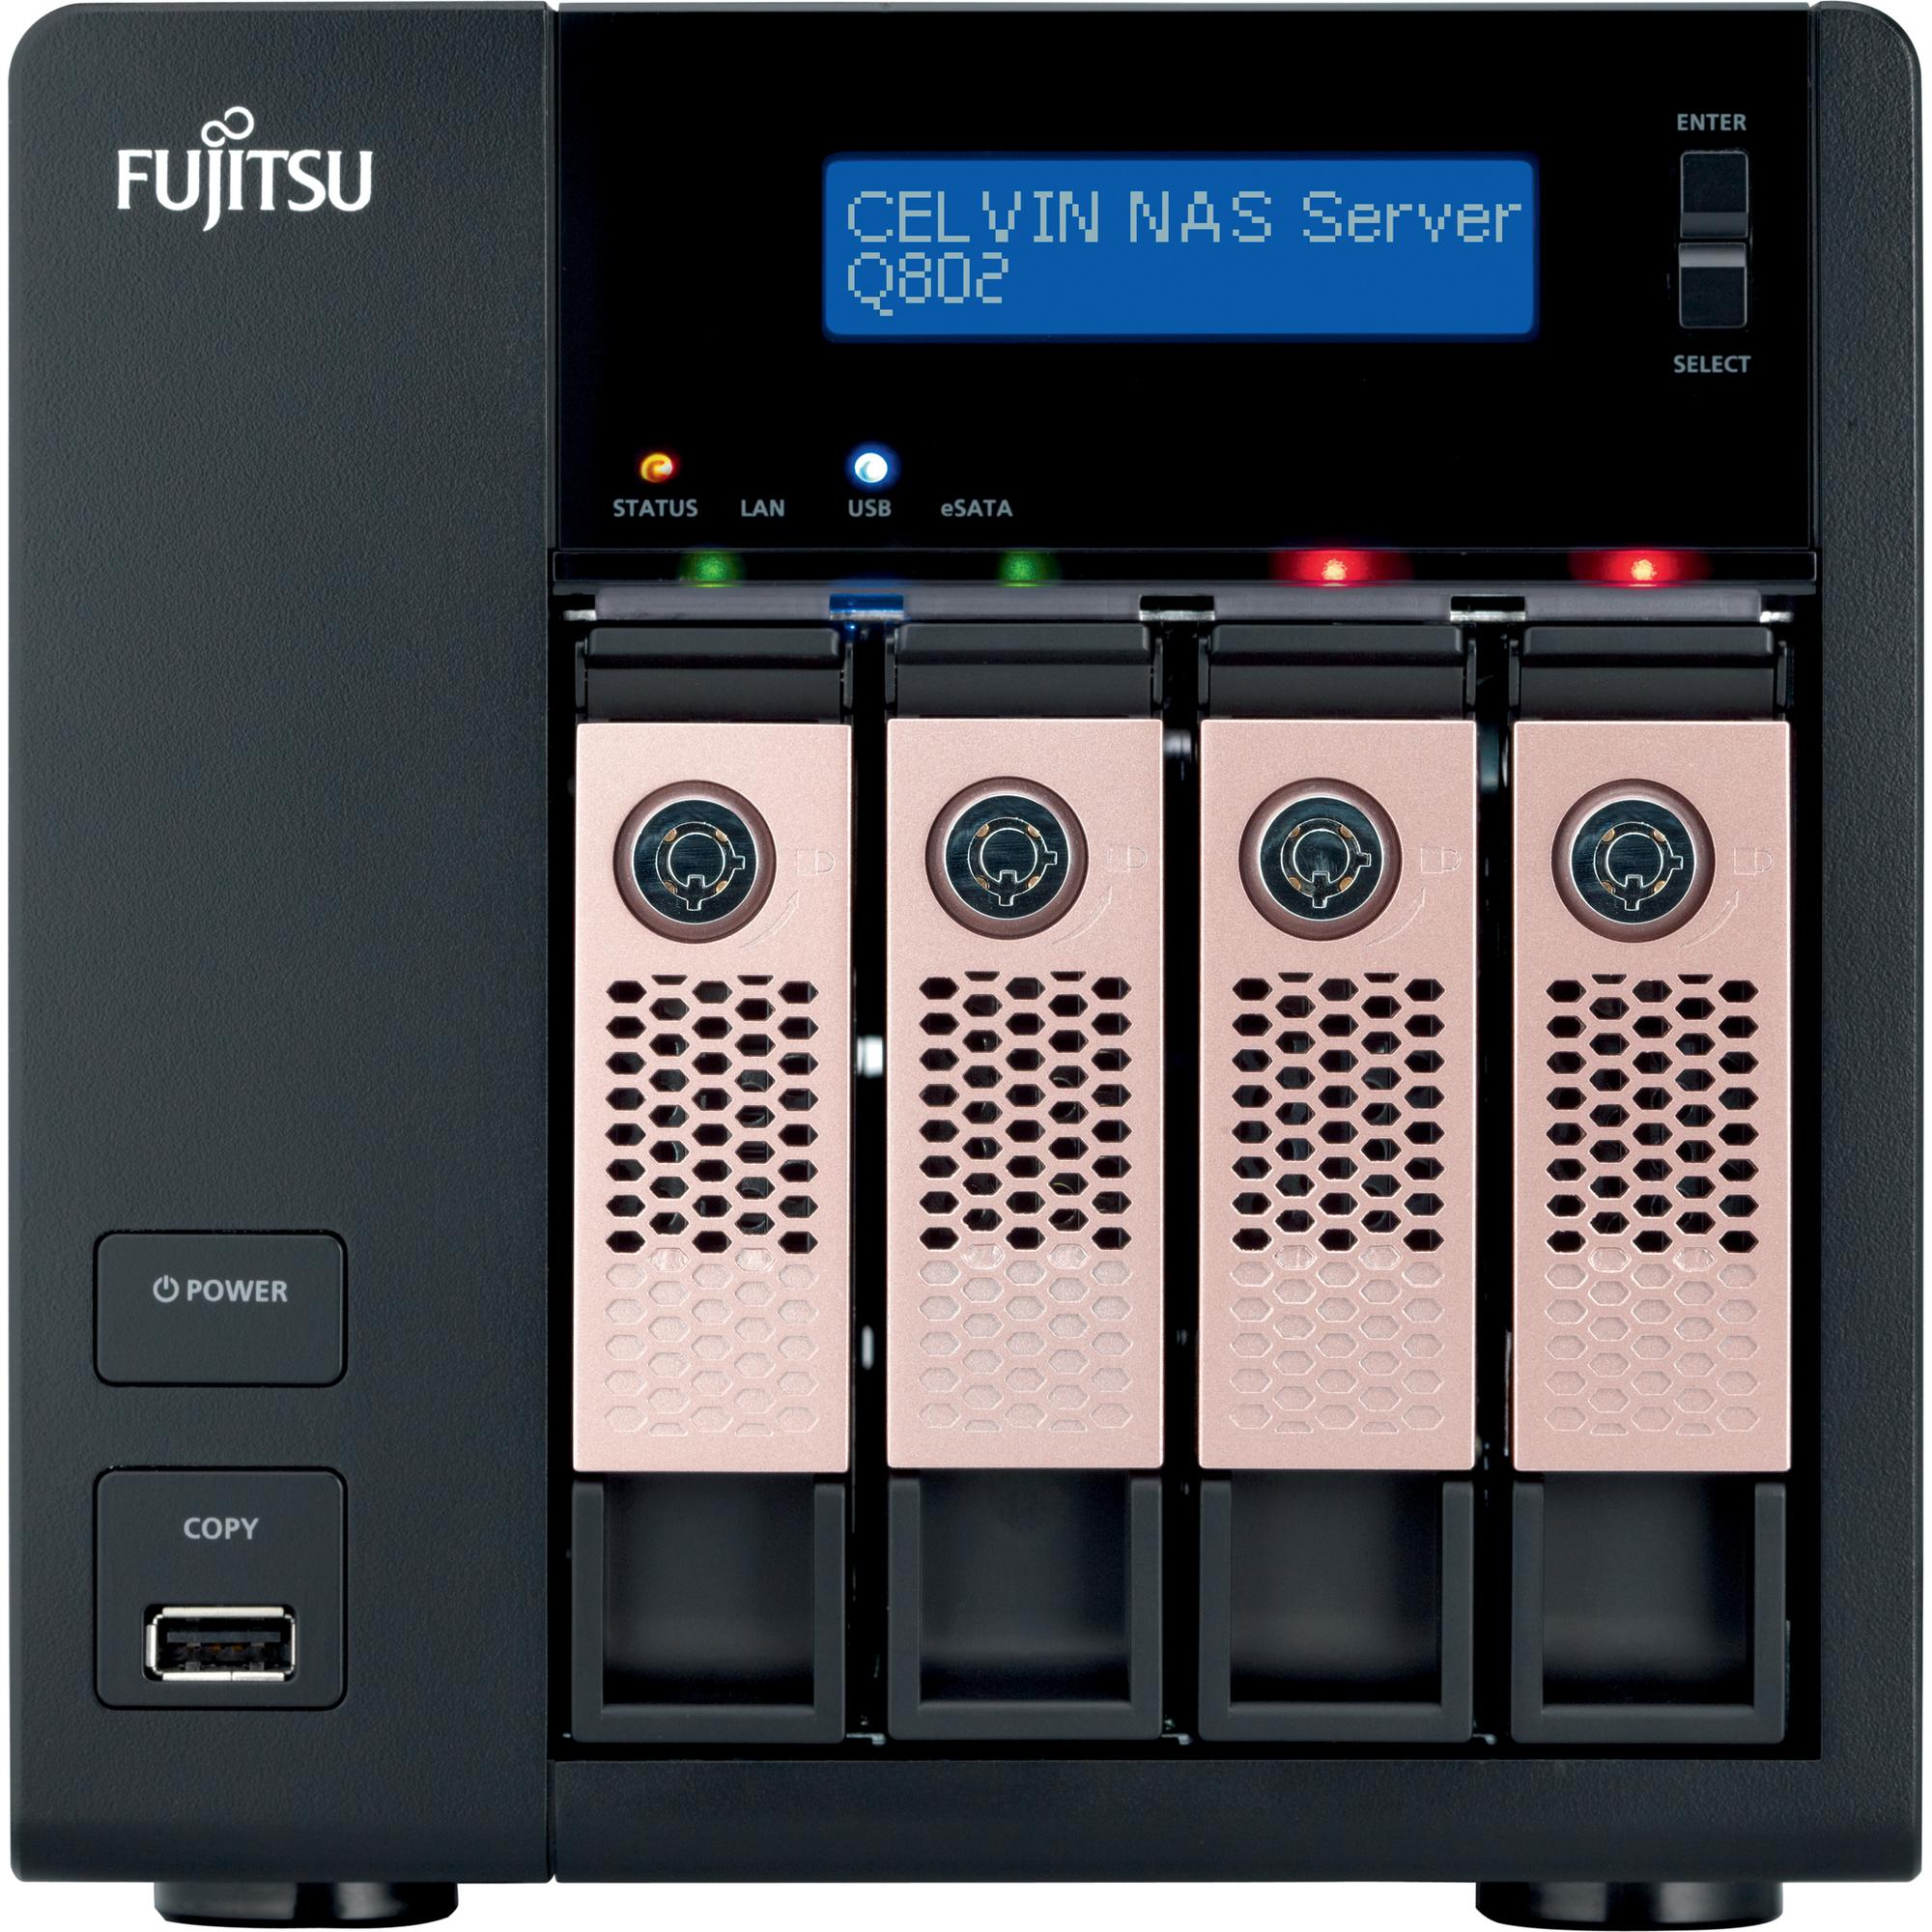 Fujitsu CELVIN Q802 4 x Total Bays NAS Server - Tower - Intel Atom2.10 GHz - 8 TB HDD 4 x 2 TB Serial ATA/600 SSD - 1 GB RAM DDR3 SDRAM - RAID Supported 0, 1, 5, 6